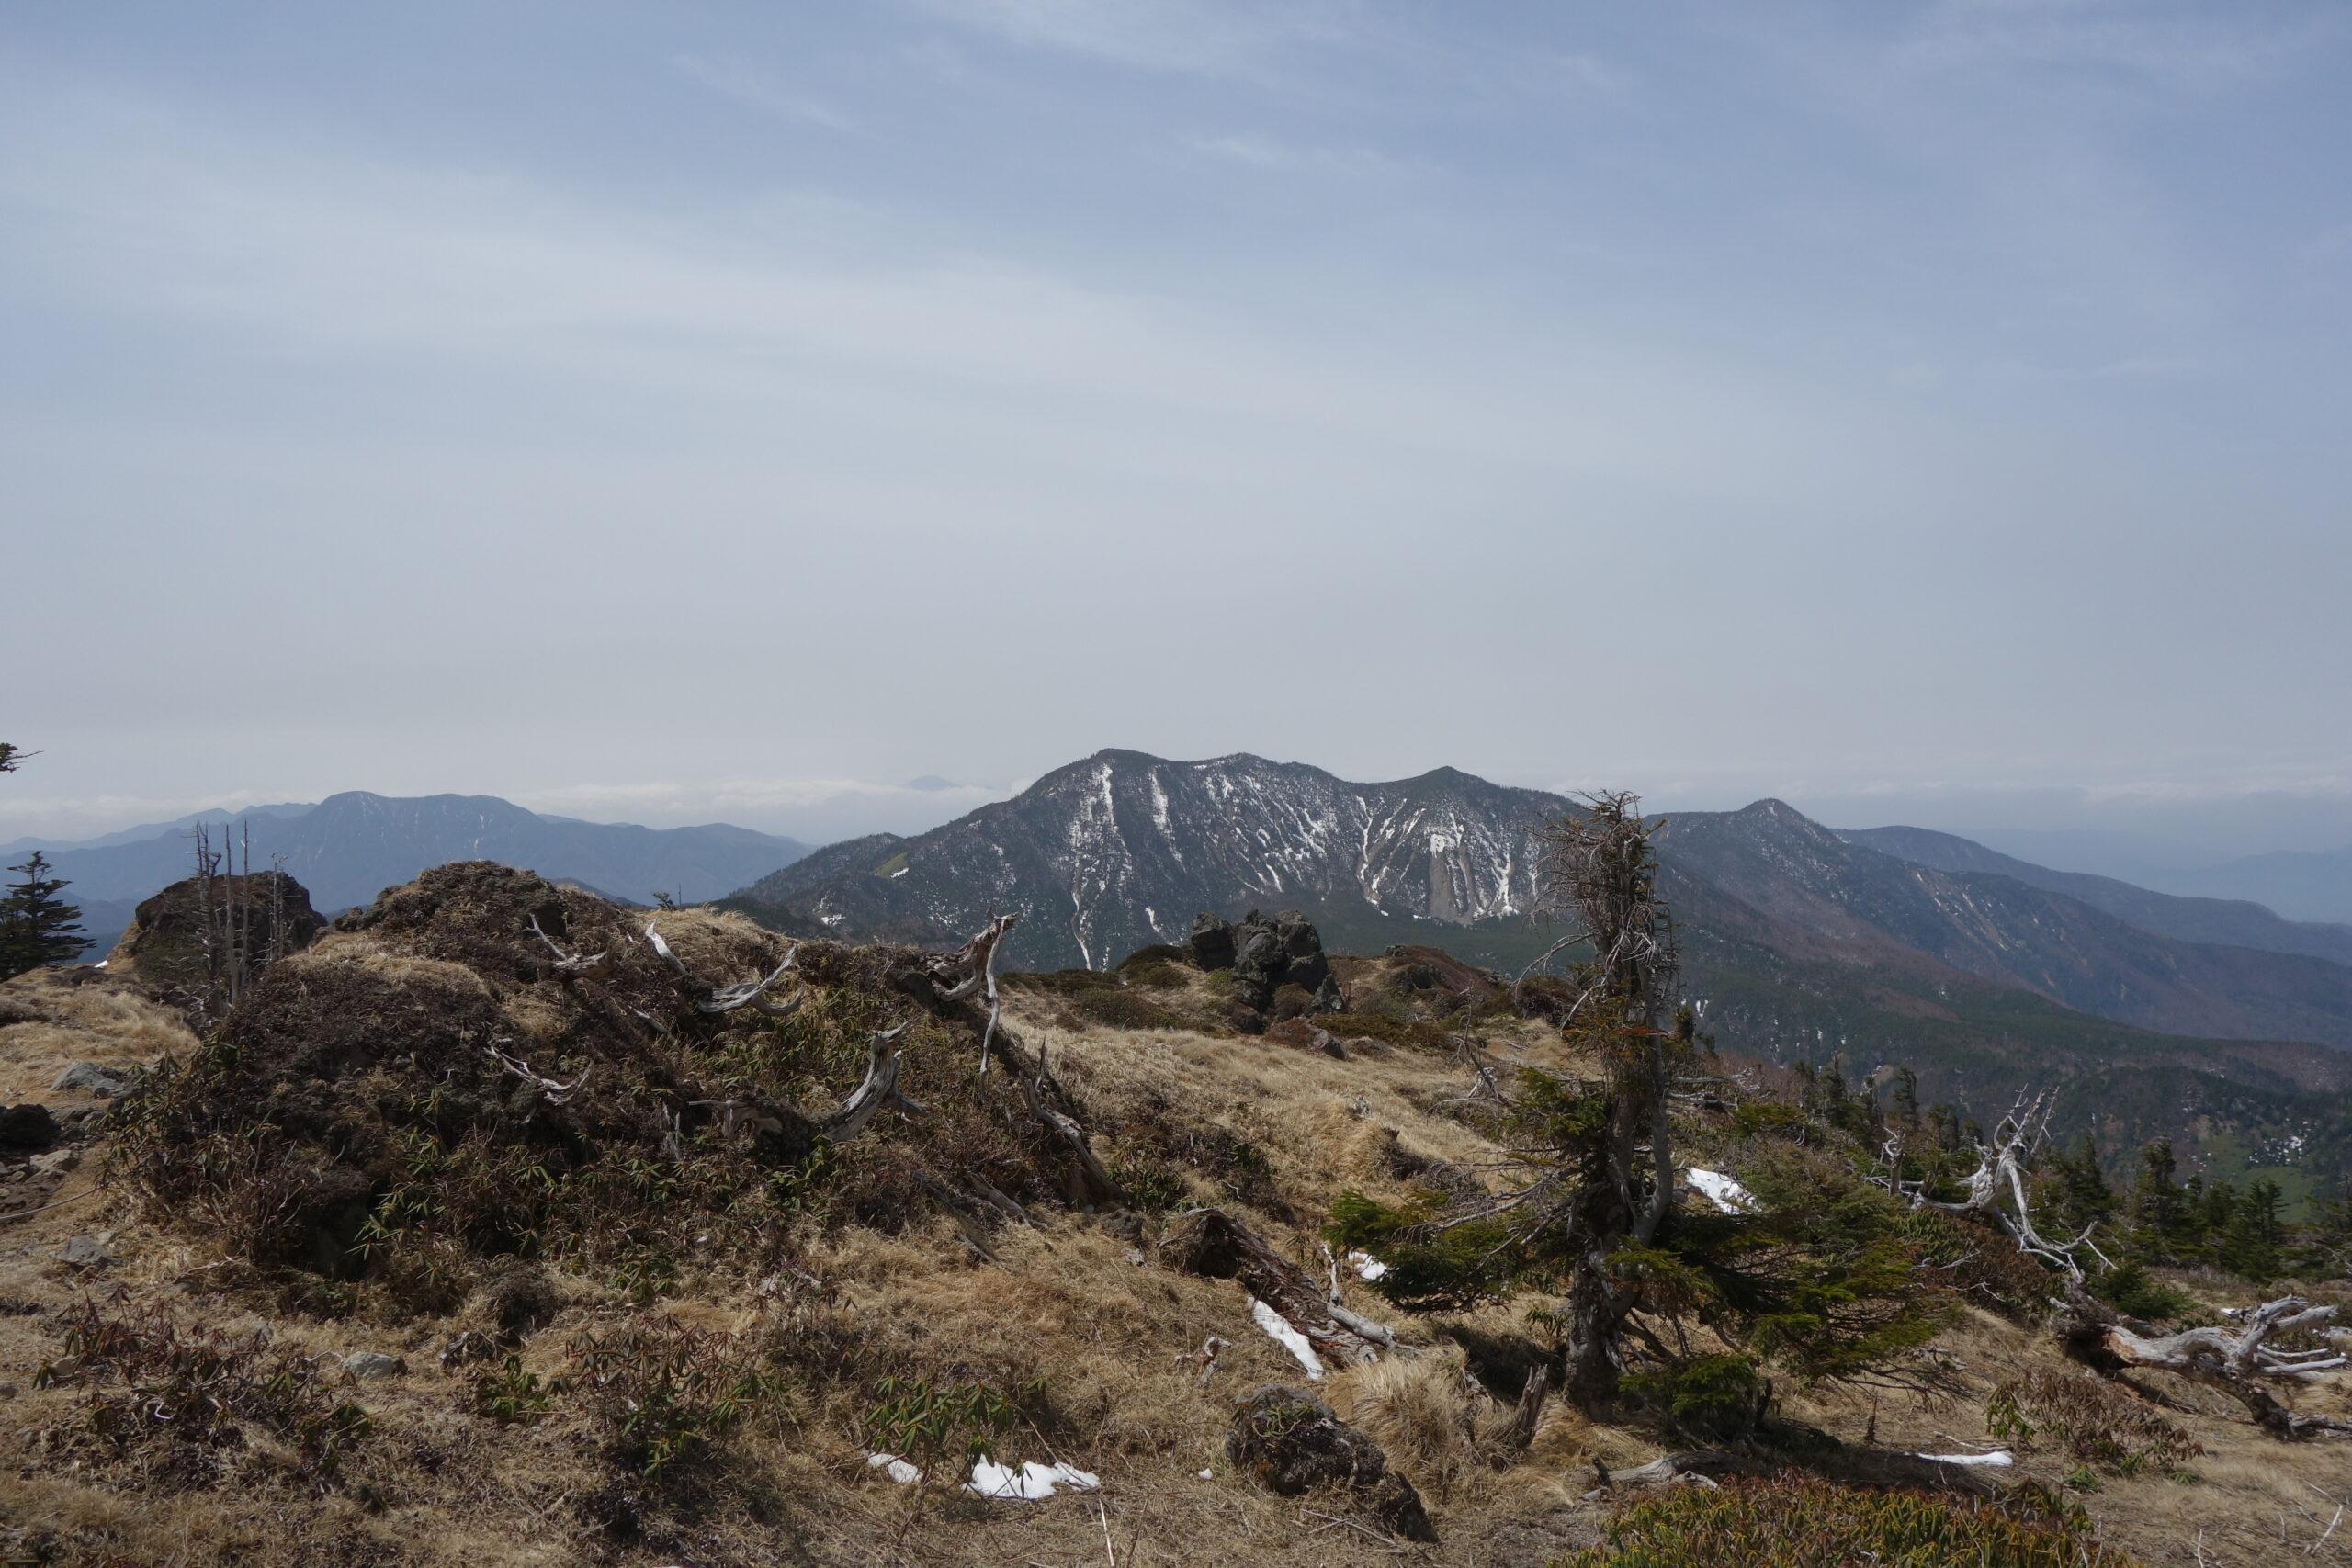 日光白根山 ロープウェイ山頂駅〜日光白根山山頂